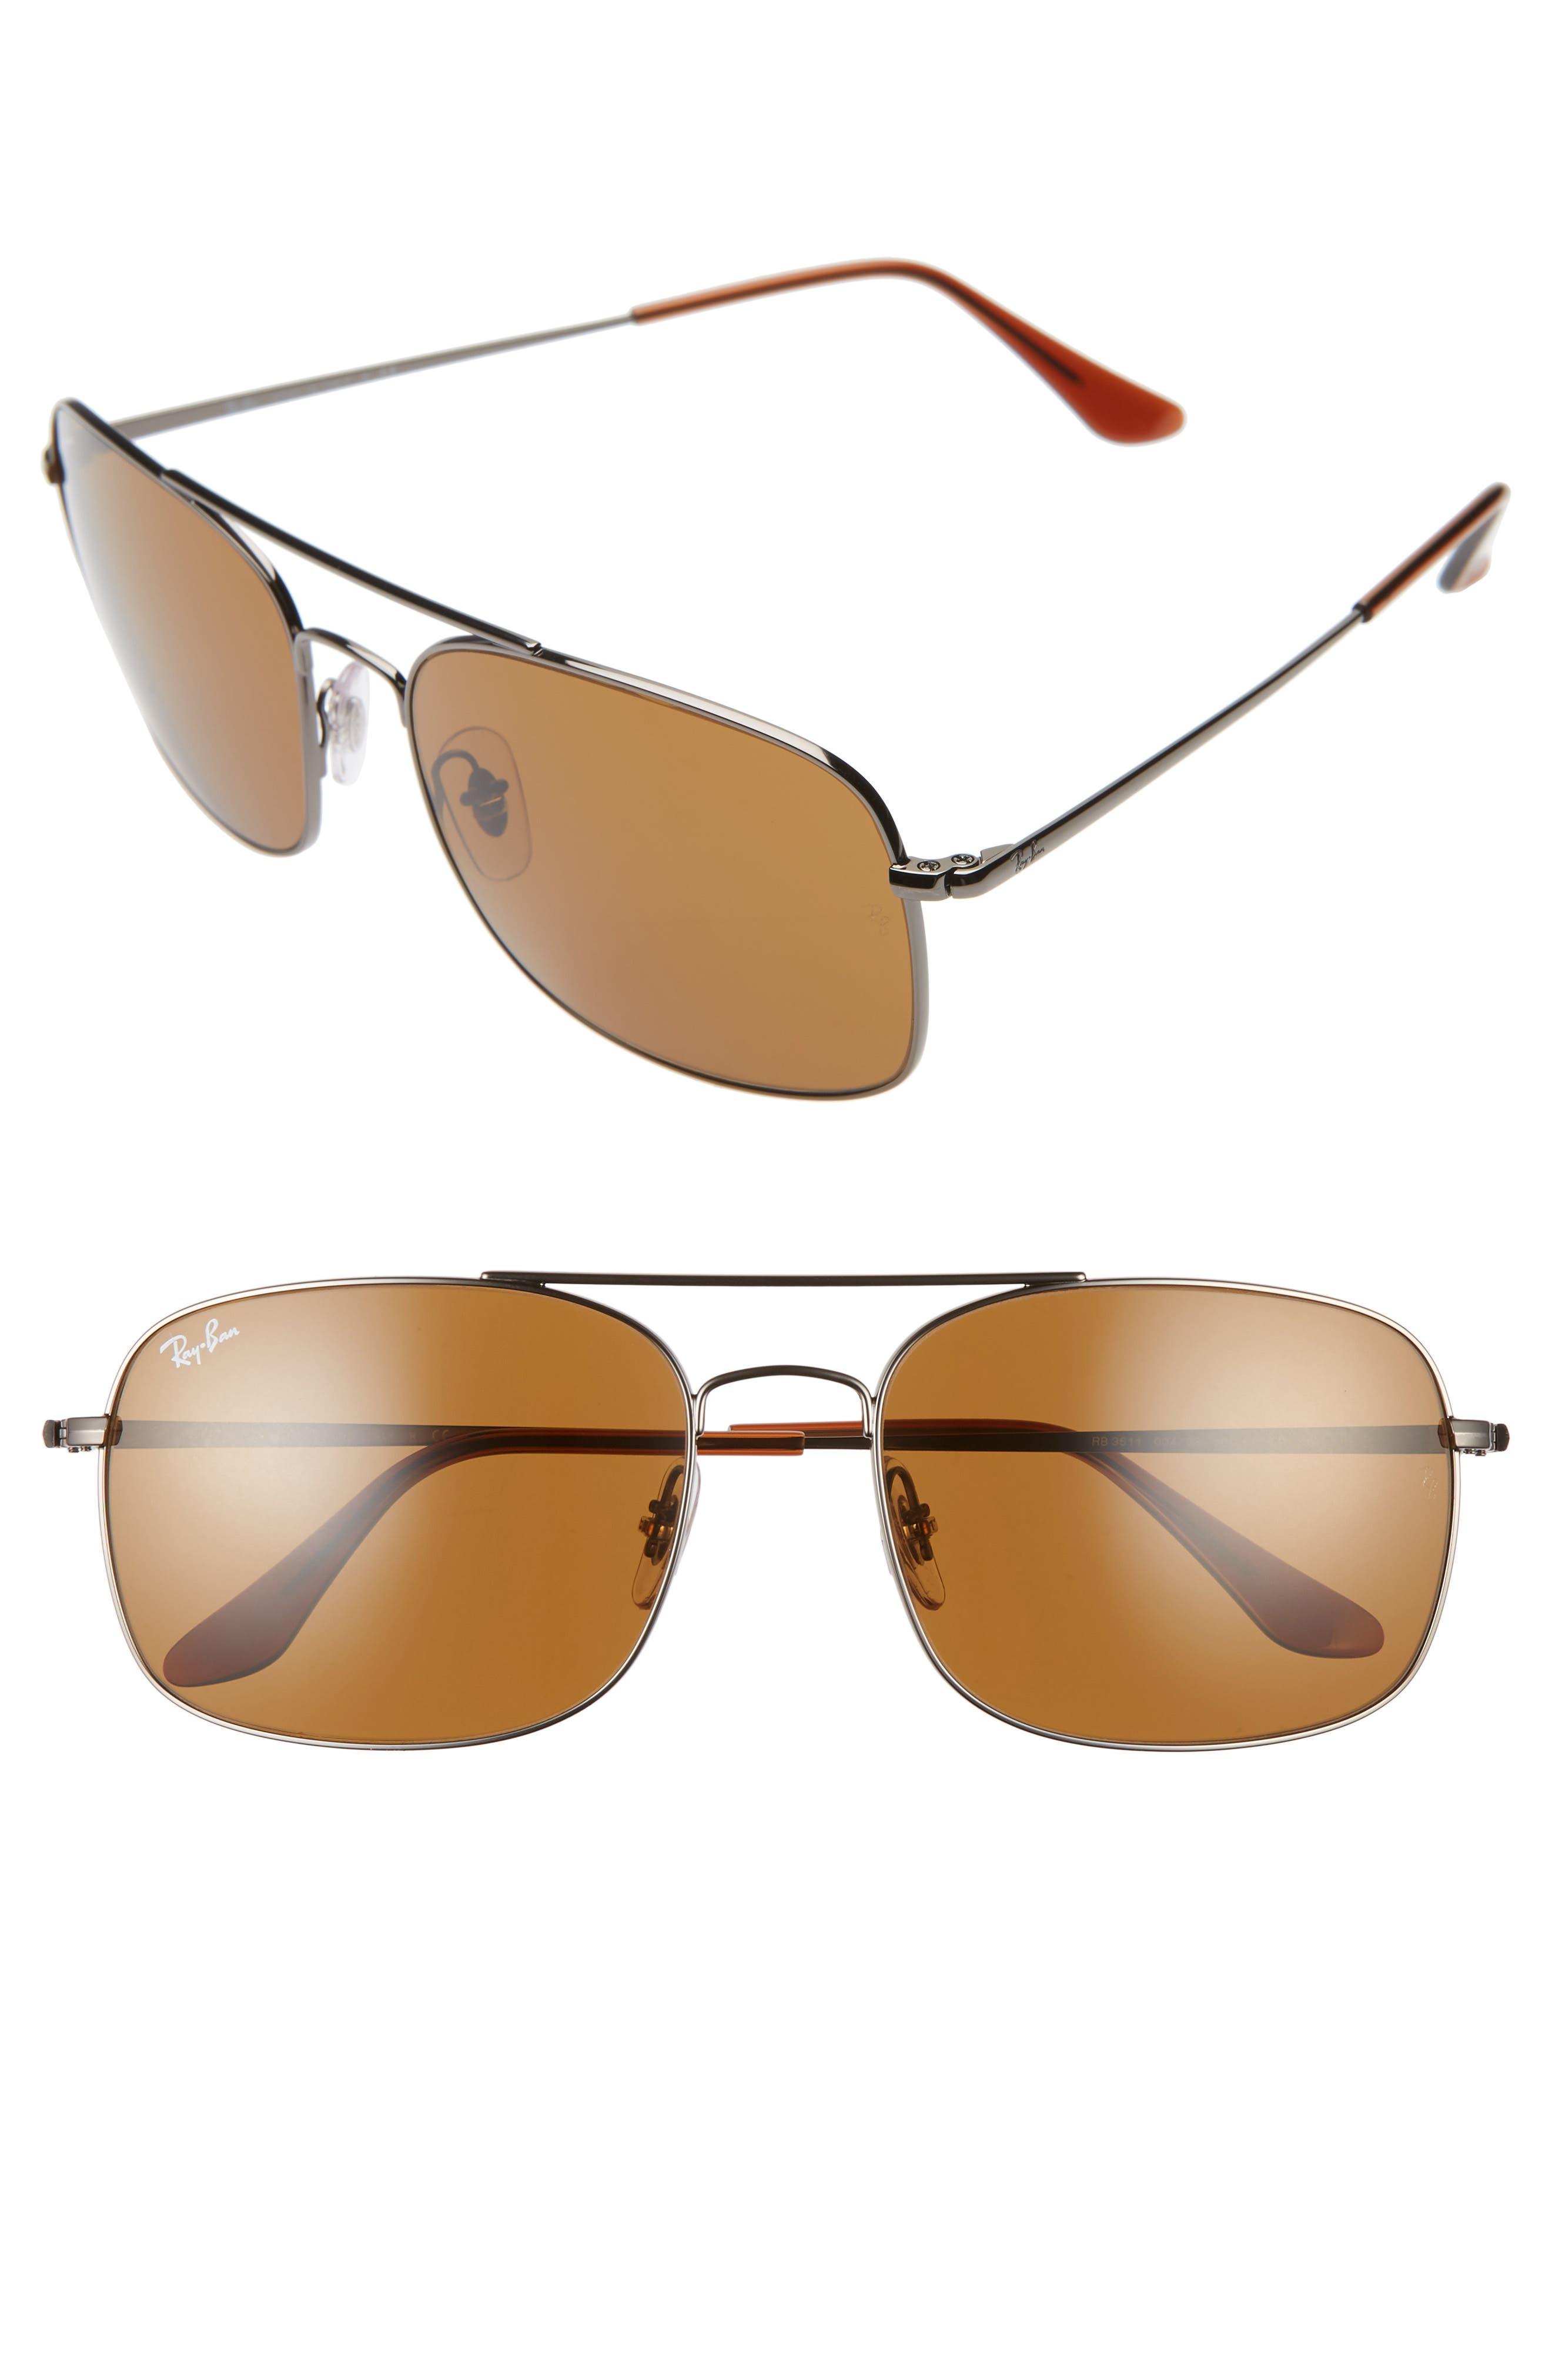 Ray-Ban 60Mm Aviator Sunglasses - Gunmetal/ Brown Solid